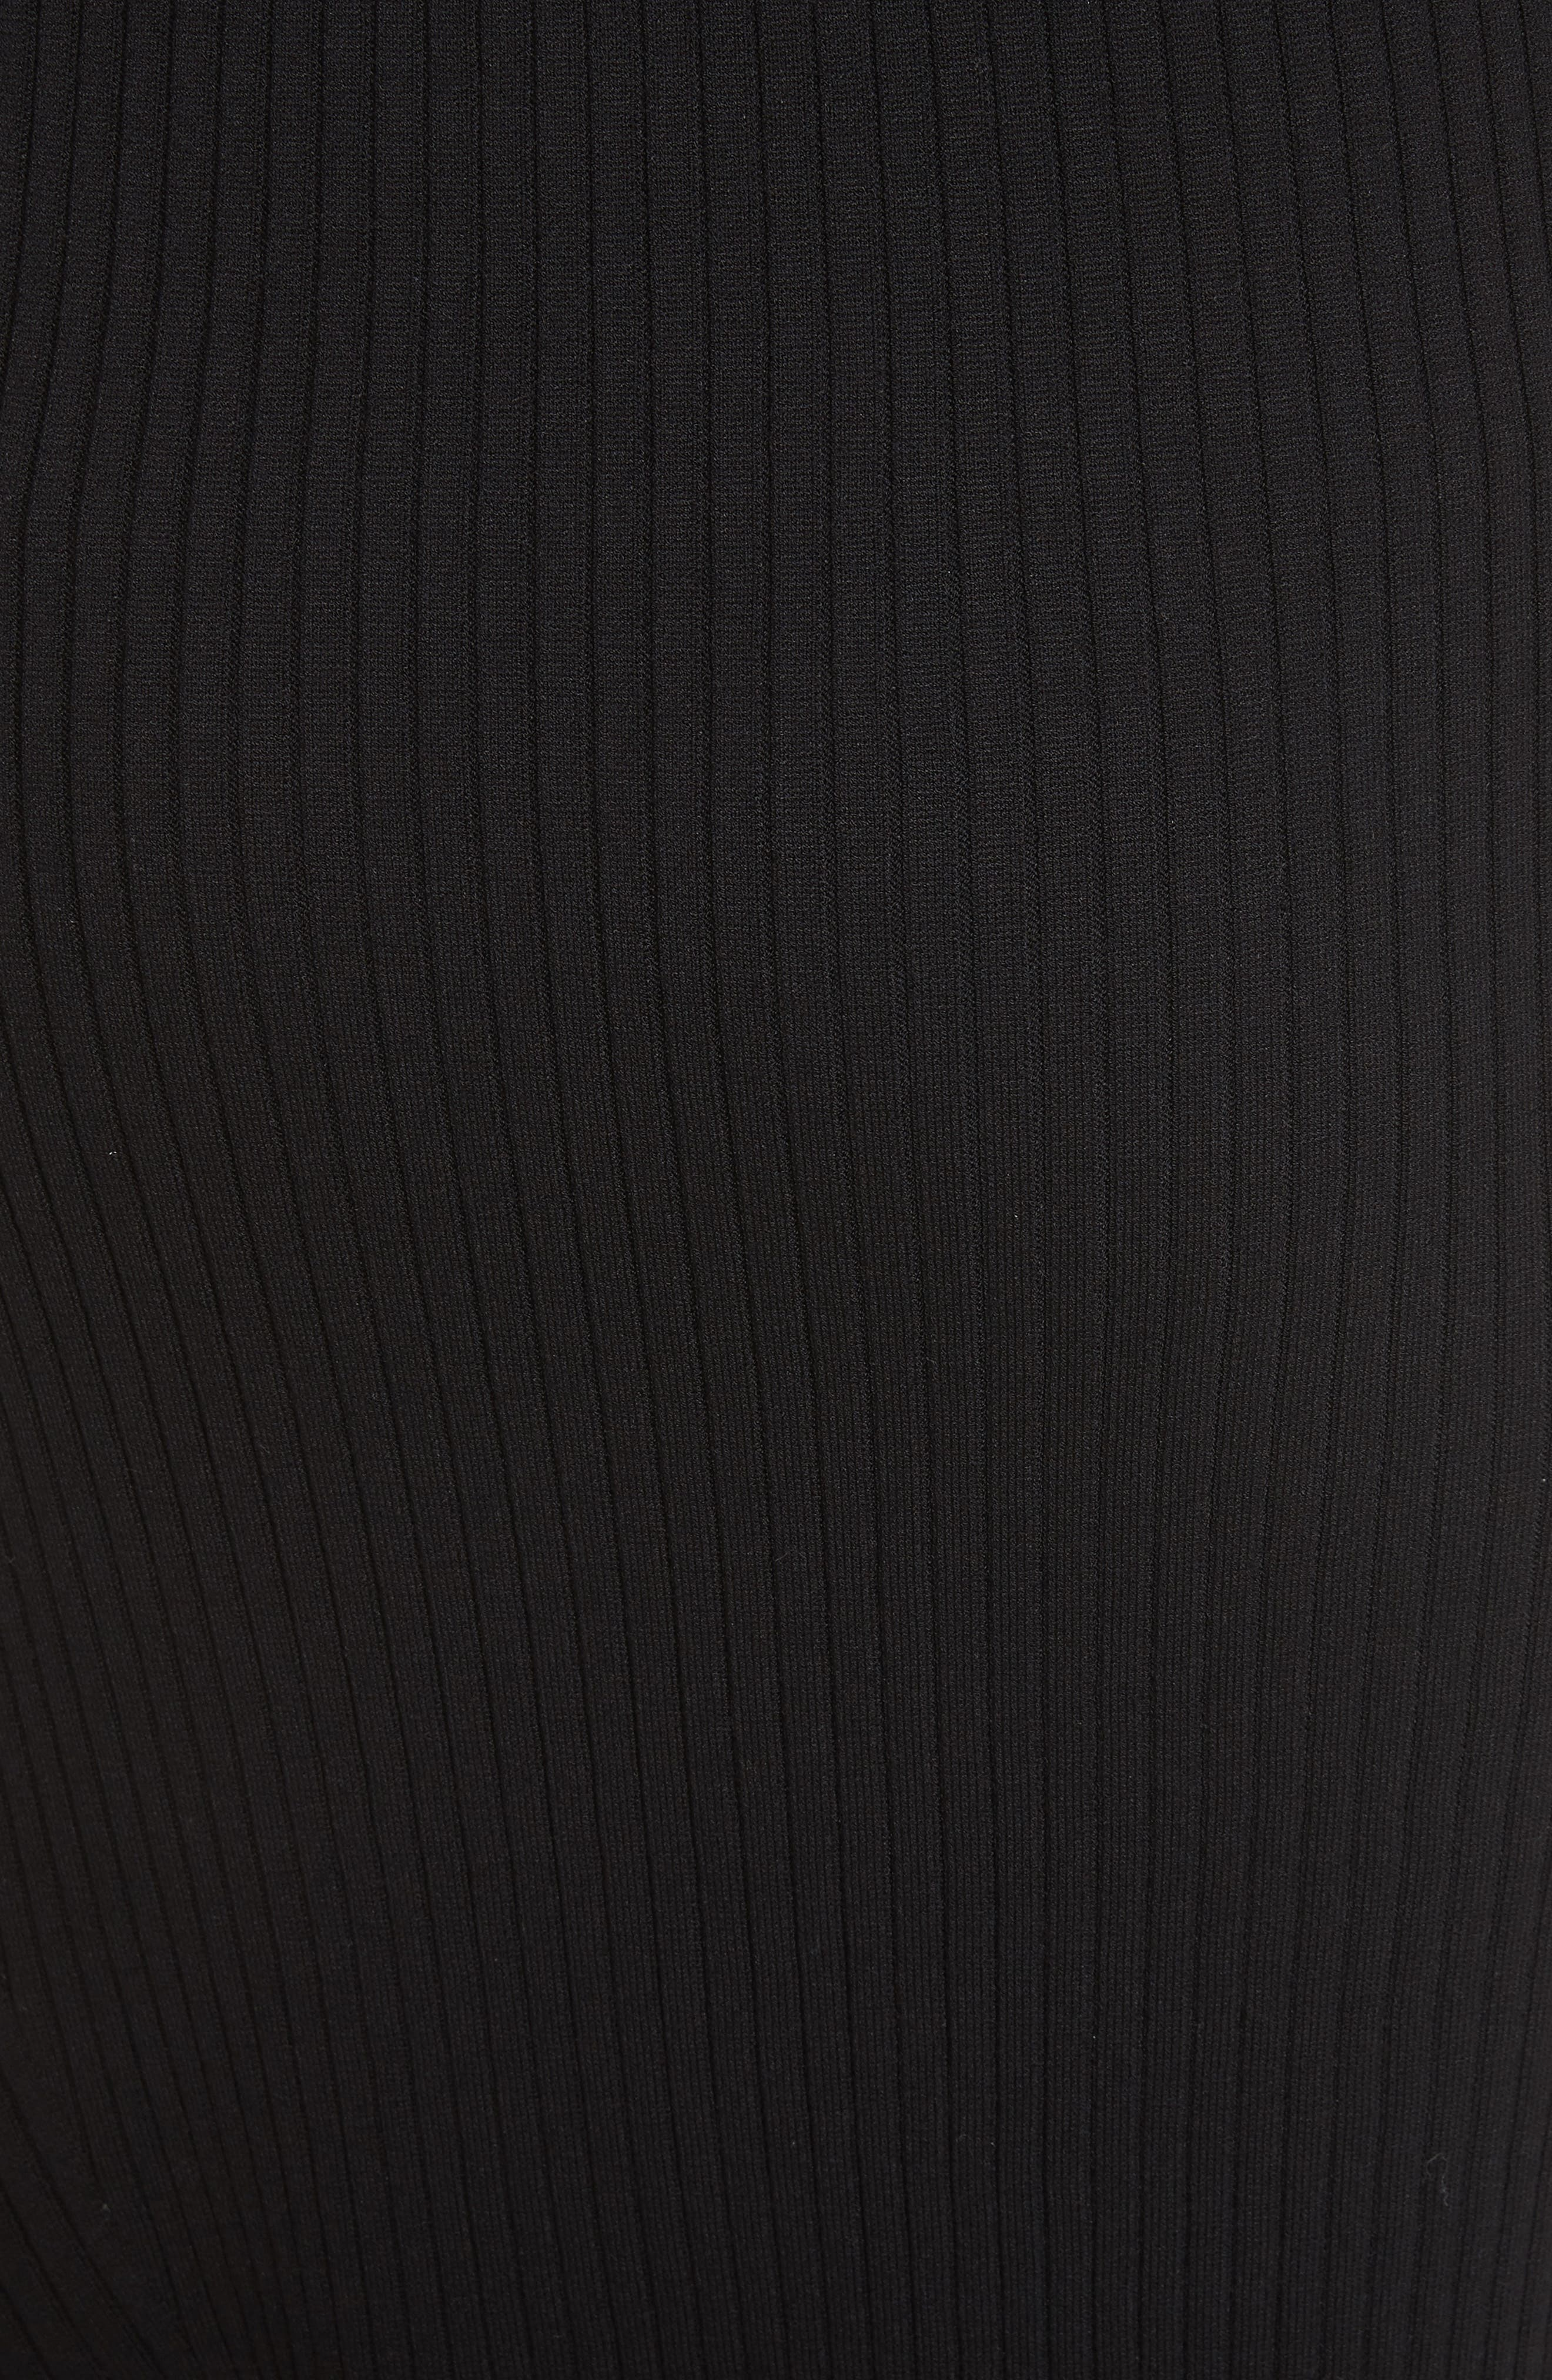 Flat Rib Knit Asymmetrical Skirt,                             Alternate thumbnail 6, color,                             CAVIAR